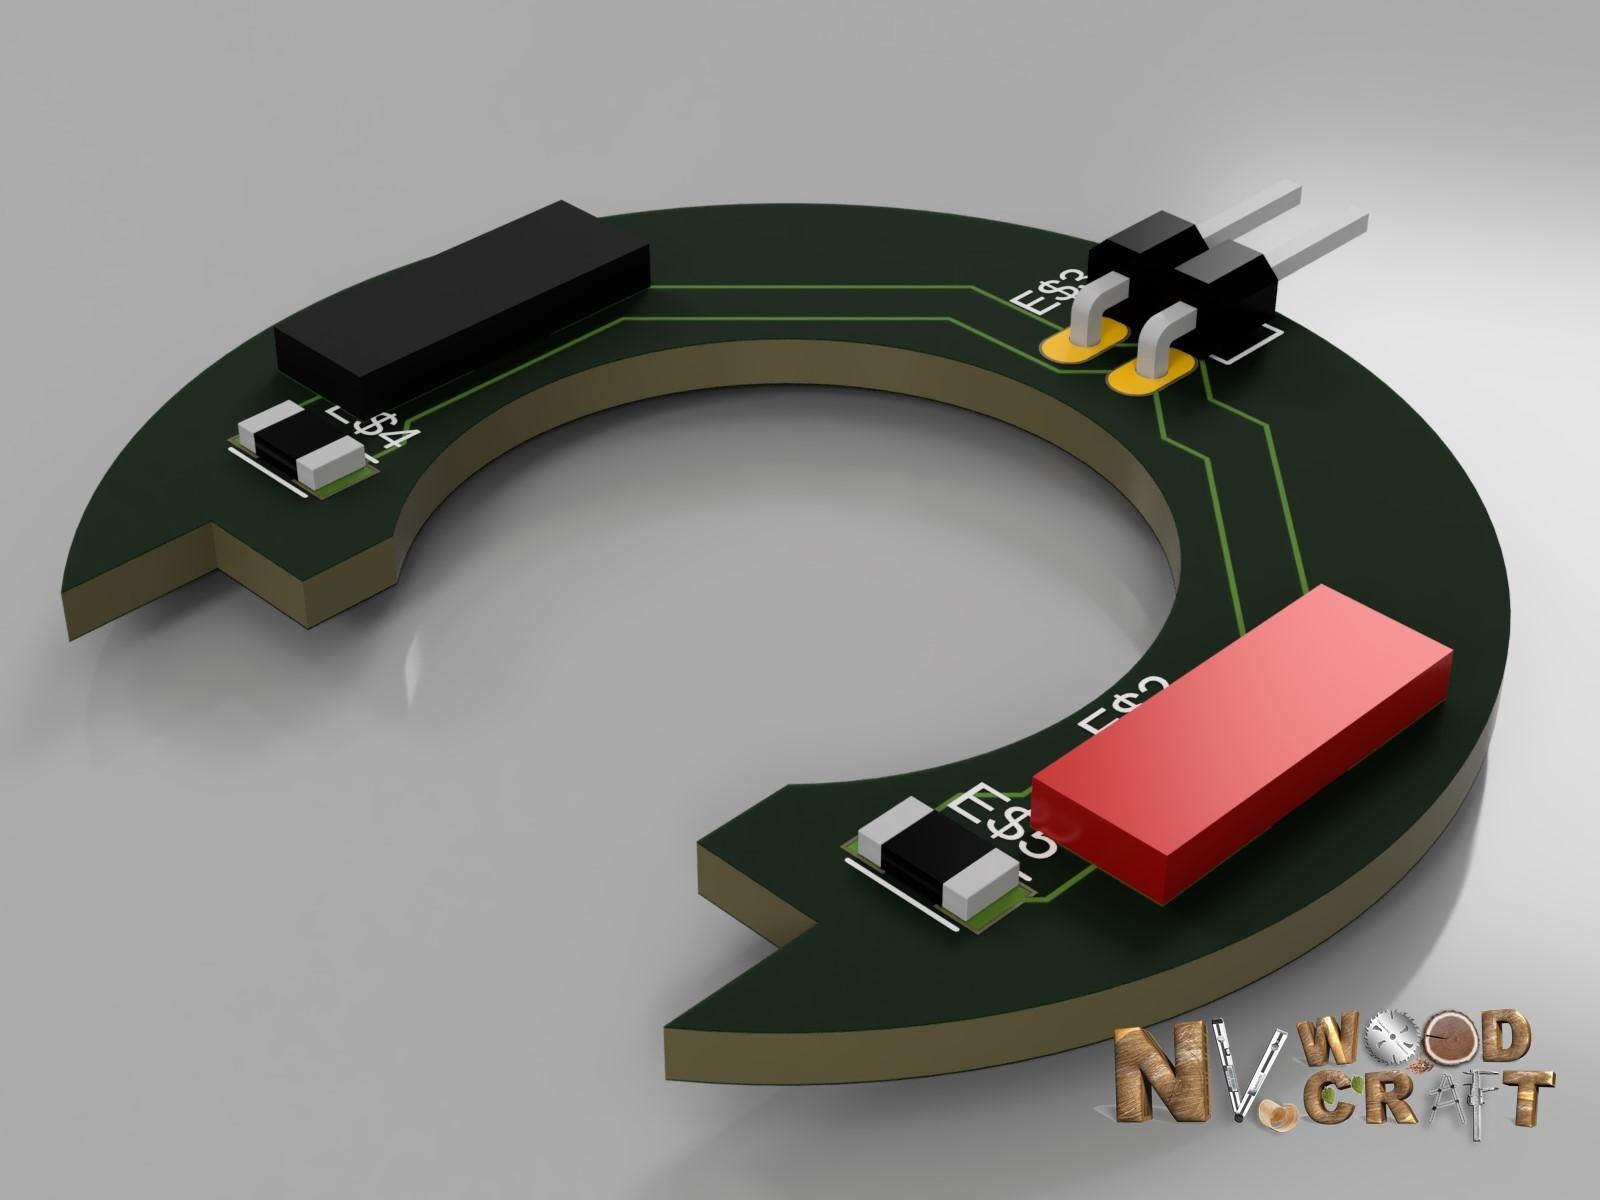 Макет подсветки для фрезера Makita RT0700CX2